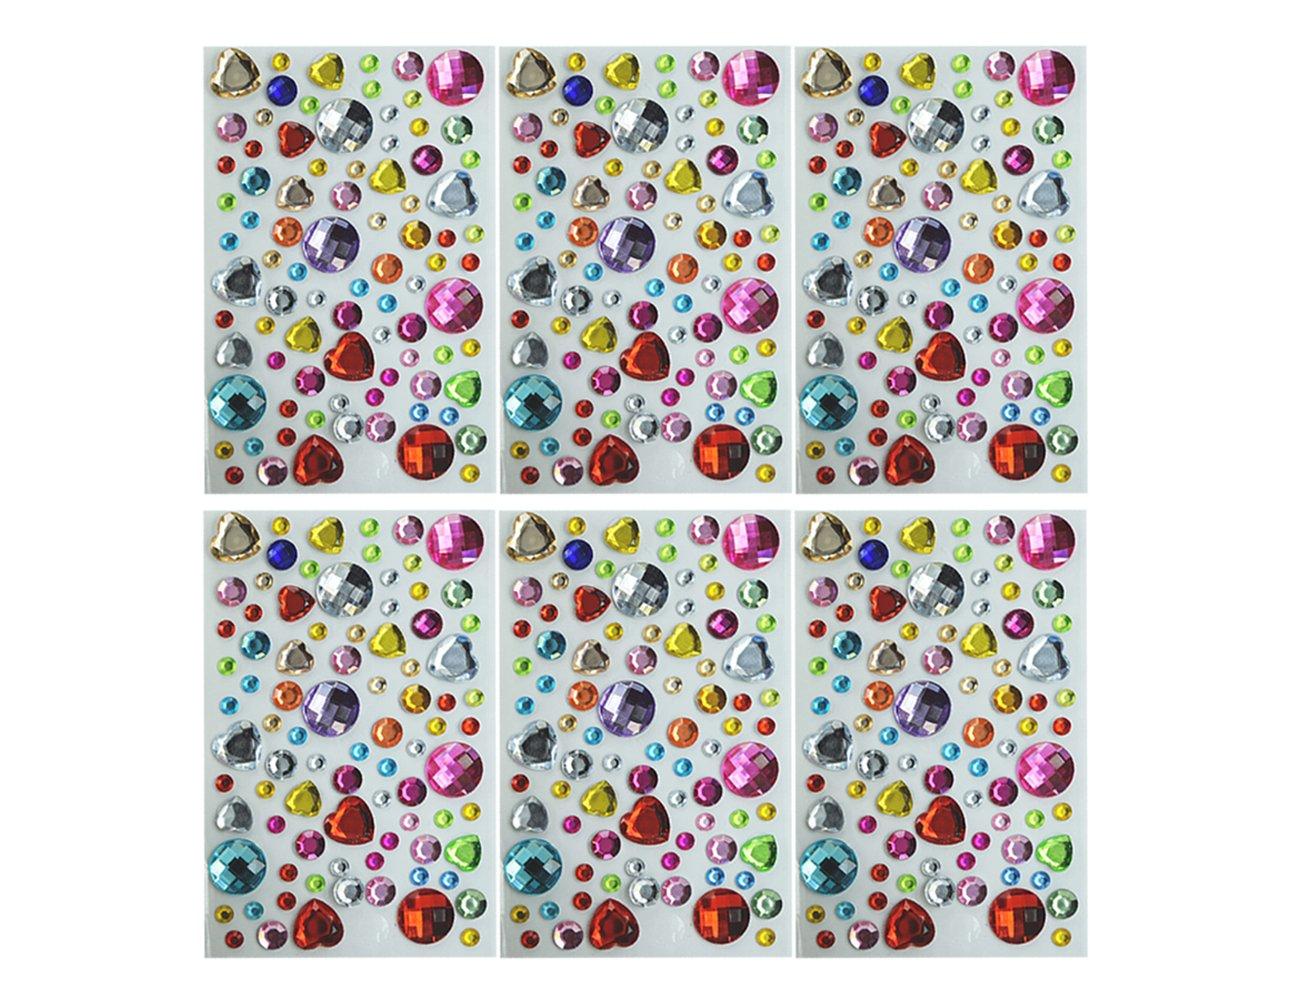 Multi-Color Bling Craft Jewelrys Crys Amariver Self-Adhesive Rhinestone Sticker